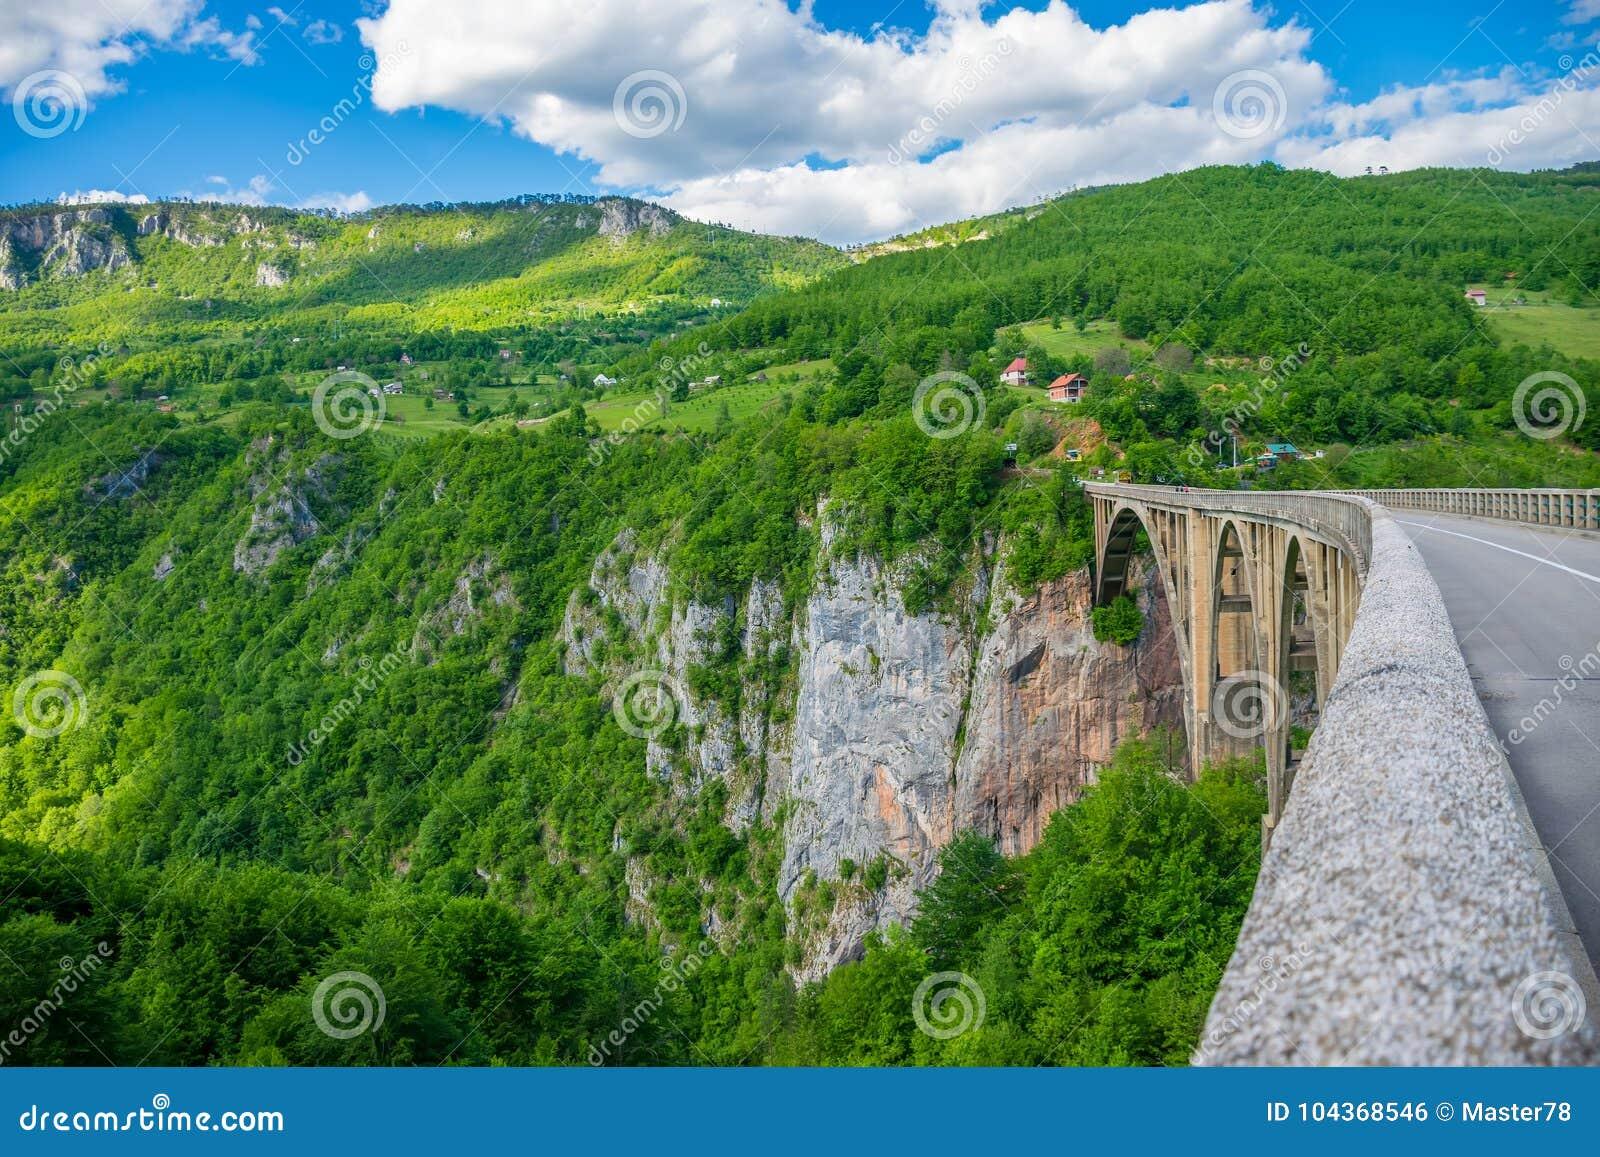 De Djurdjevic-Brug kruist de canion van Tara River